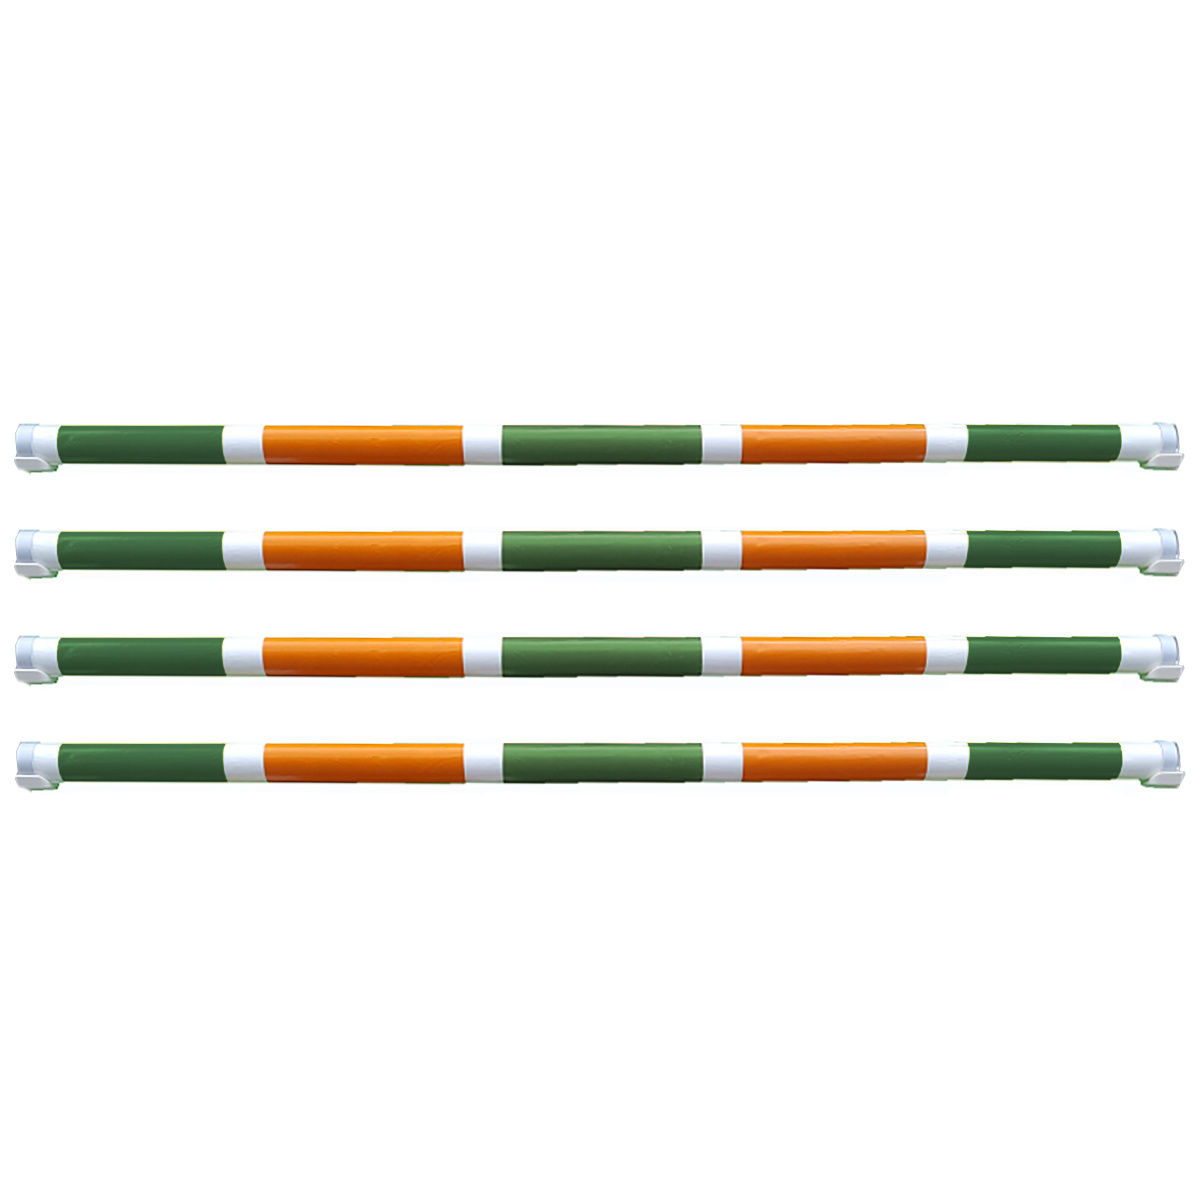 Hindernisbalk *Luxury serie* groen, wit, oranje